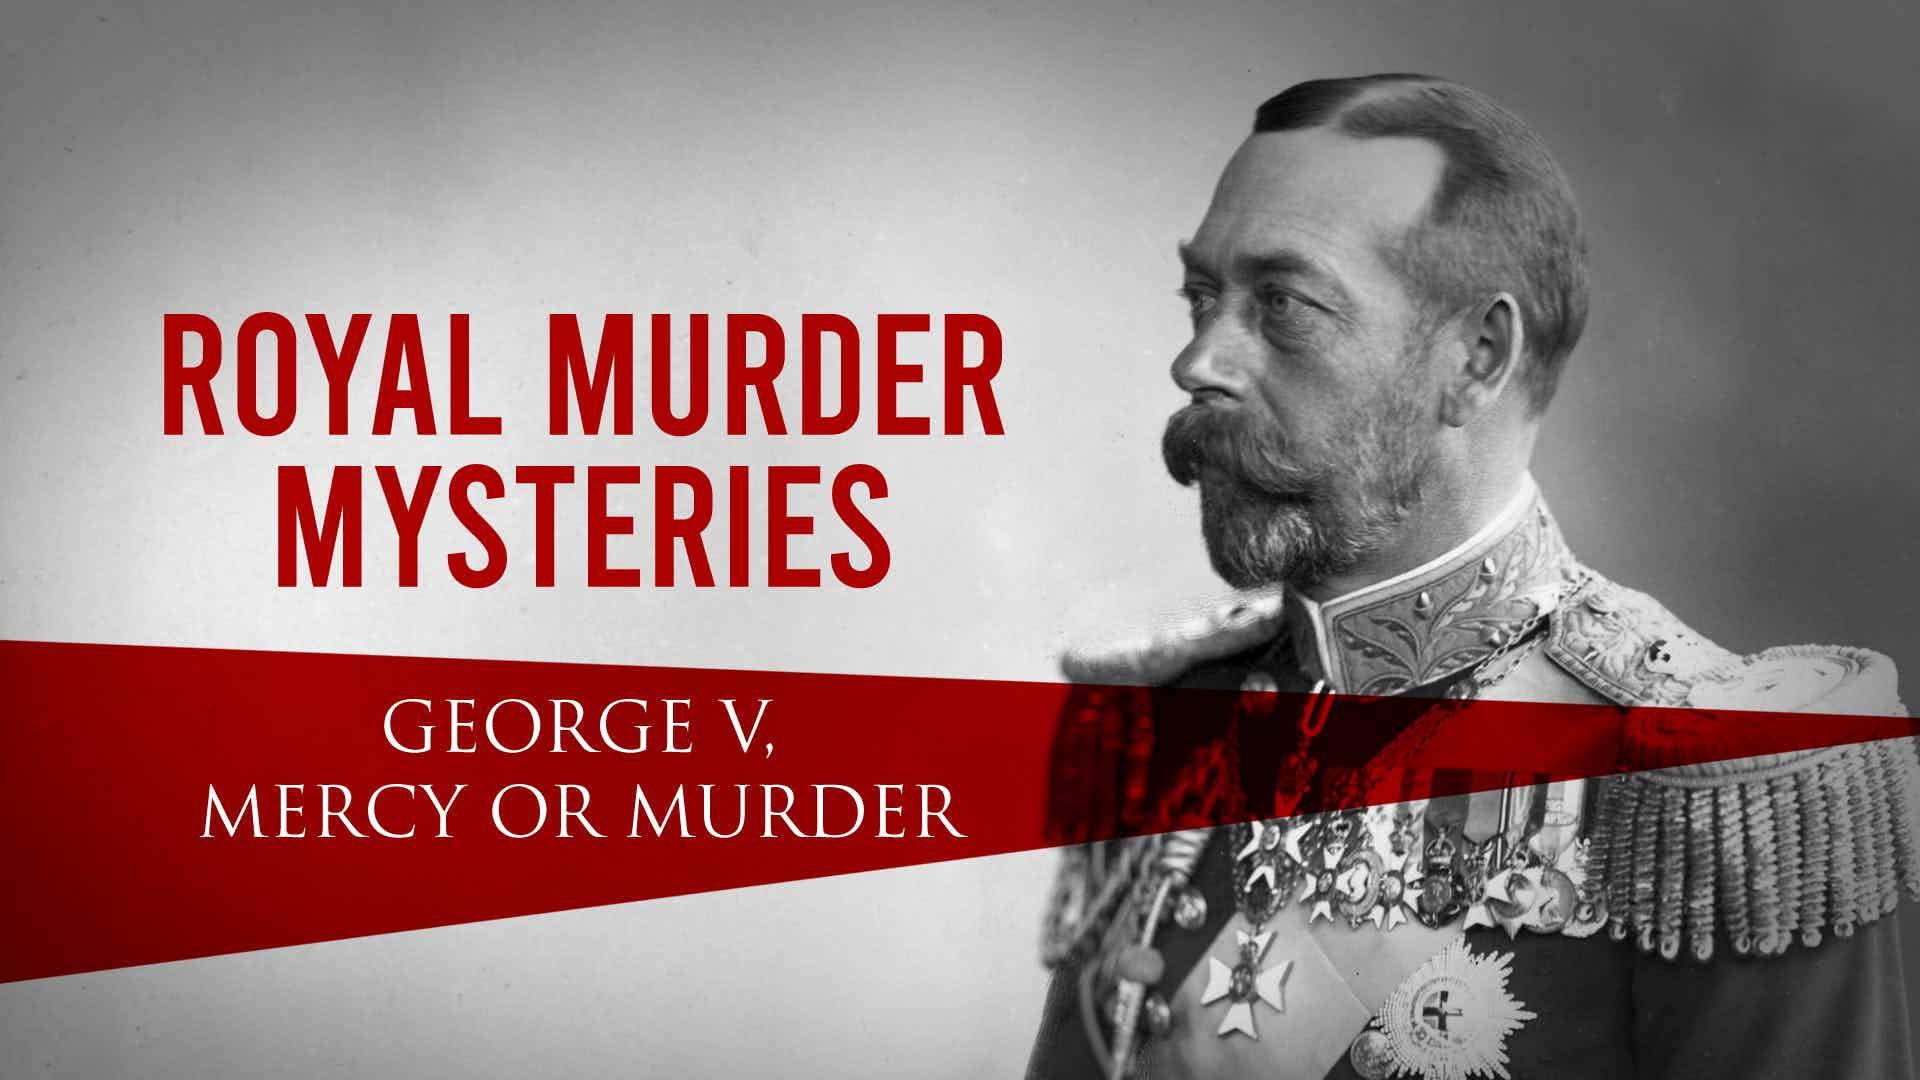 Royal Murder Mysteries: George V. Mercy or Murder?